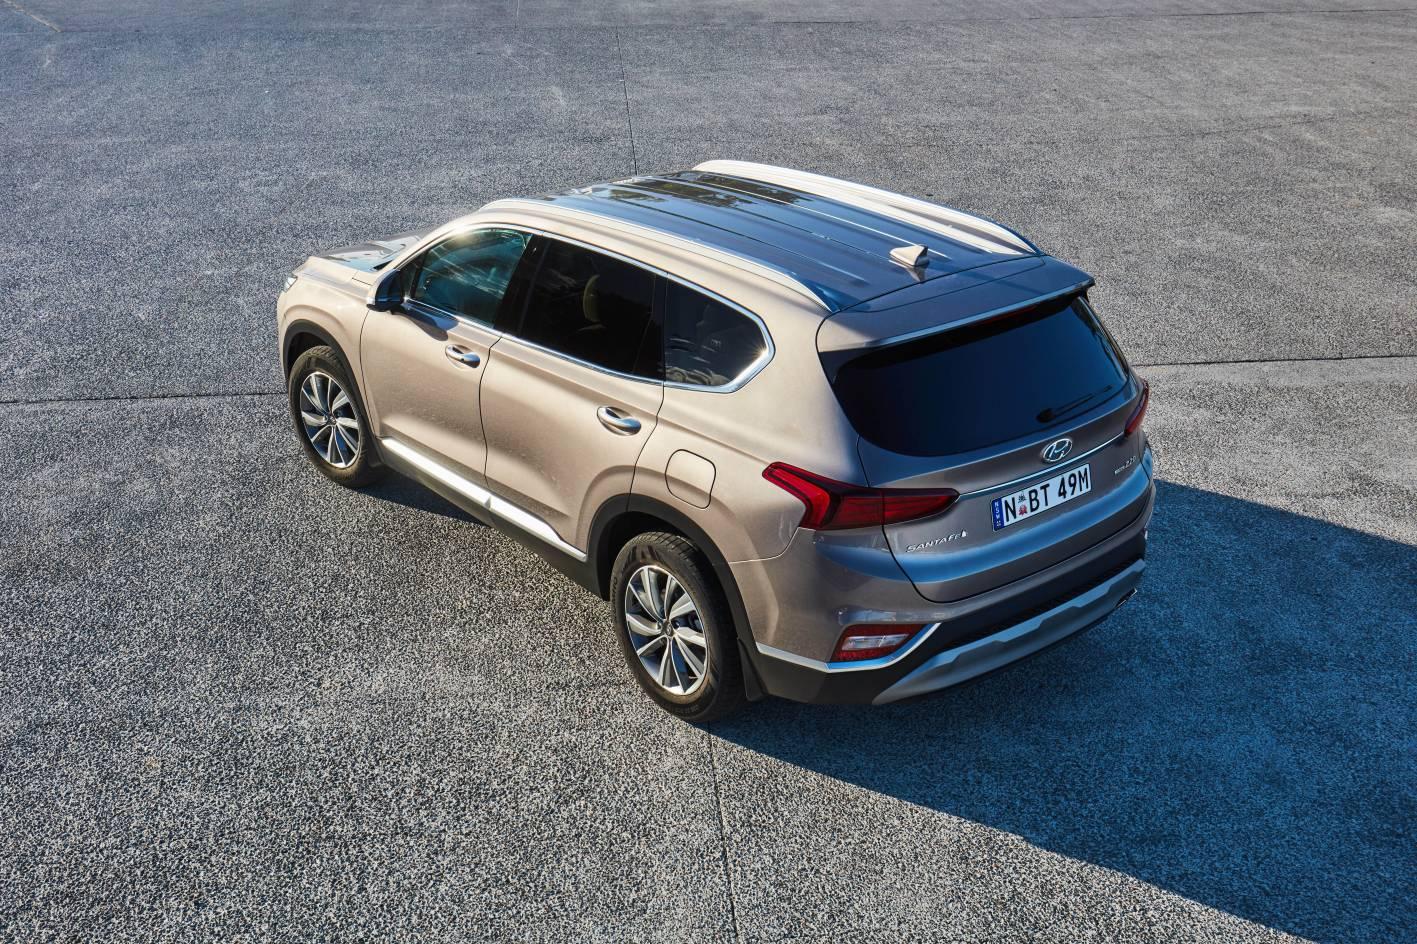 Hyundai's new Santa Fe SUV - 3